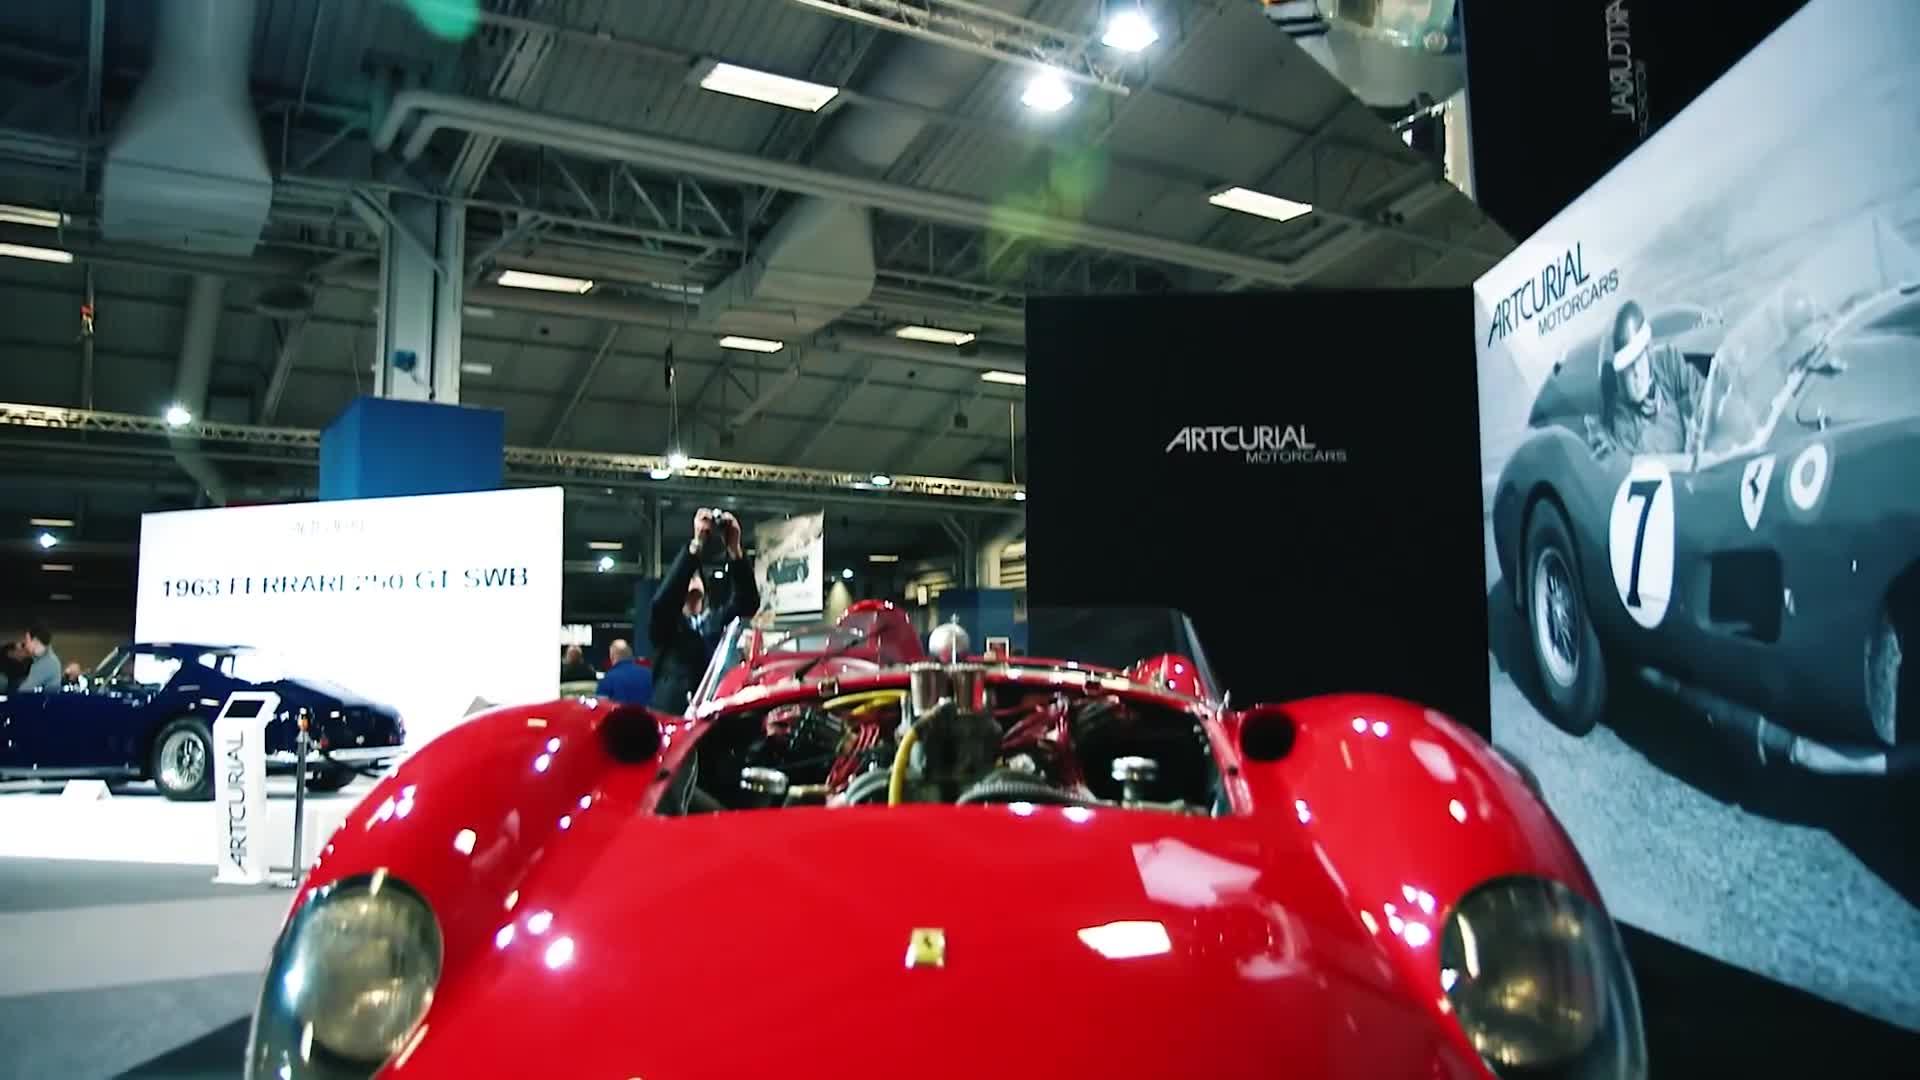 Ferrari 335 Sport Scaglietti trở thành chiếc xe đắt nhất thế giới